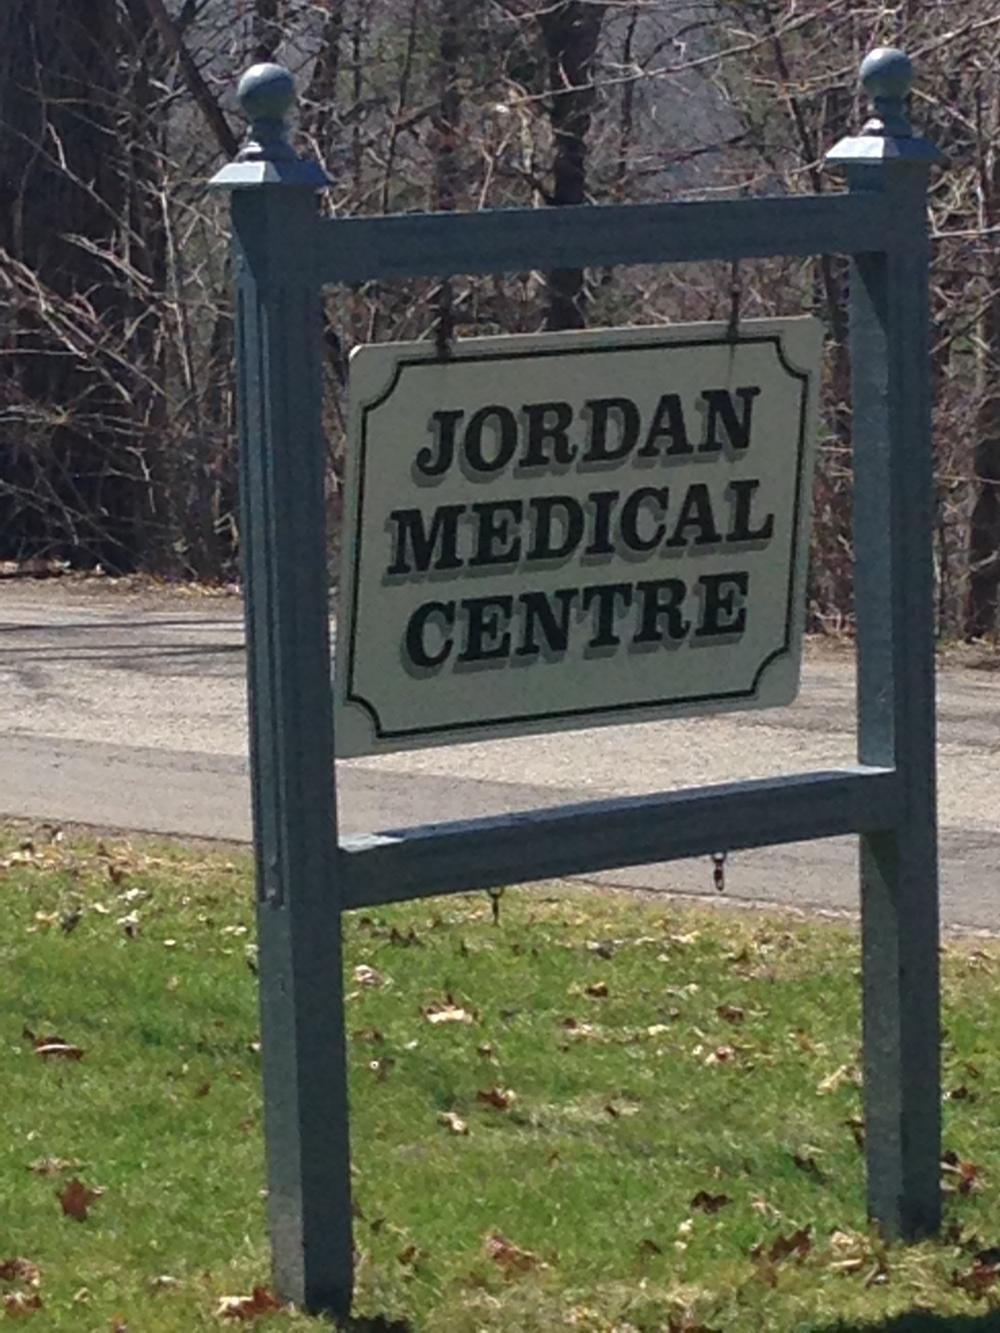 Jordan Station Clinic